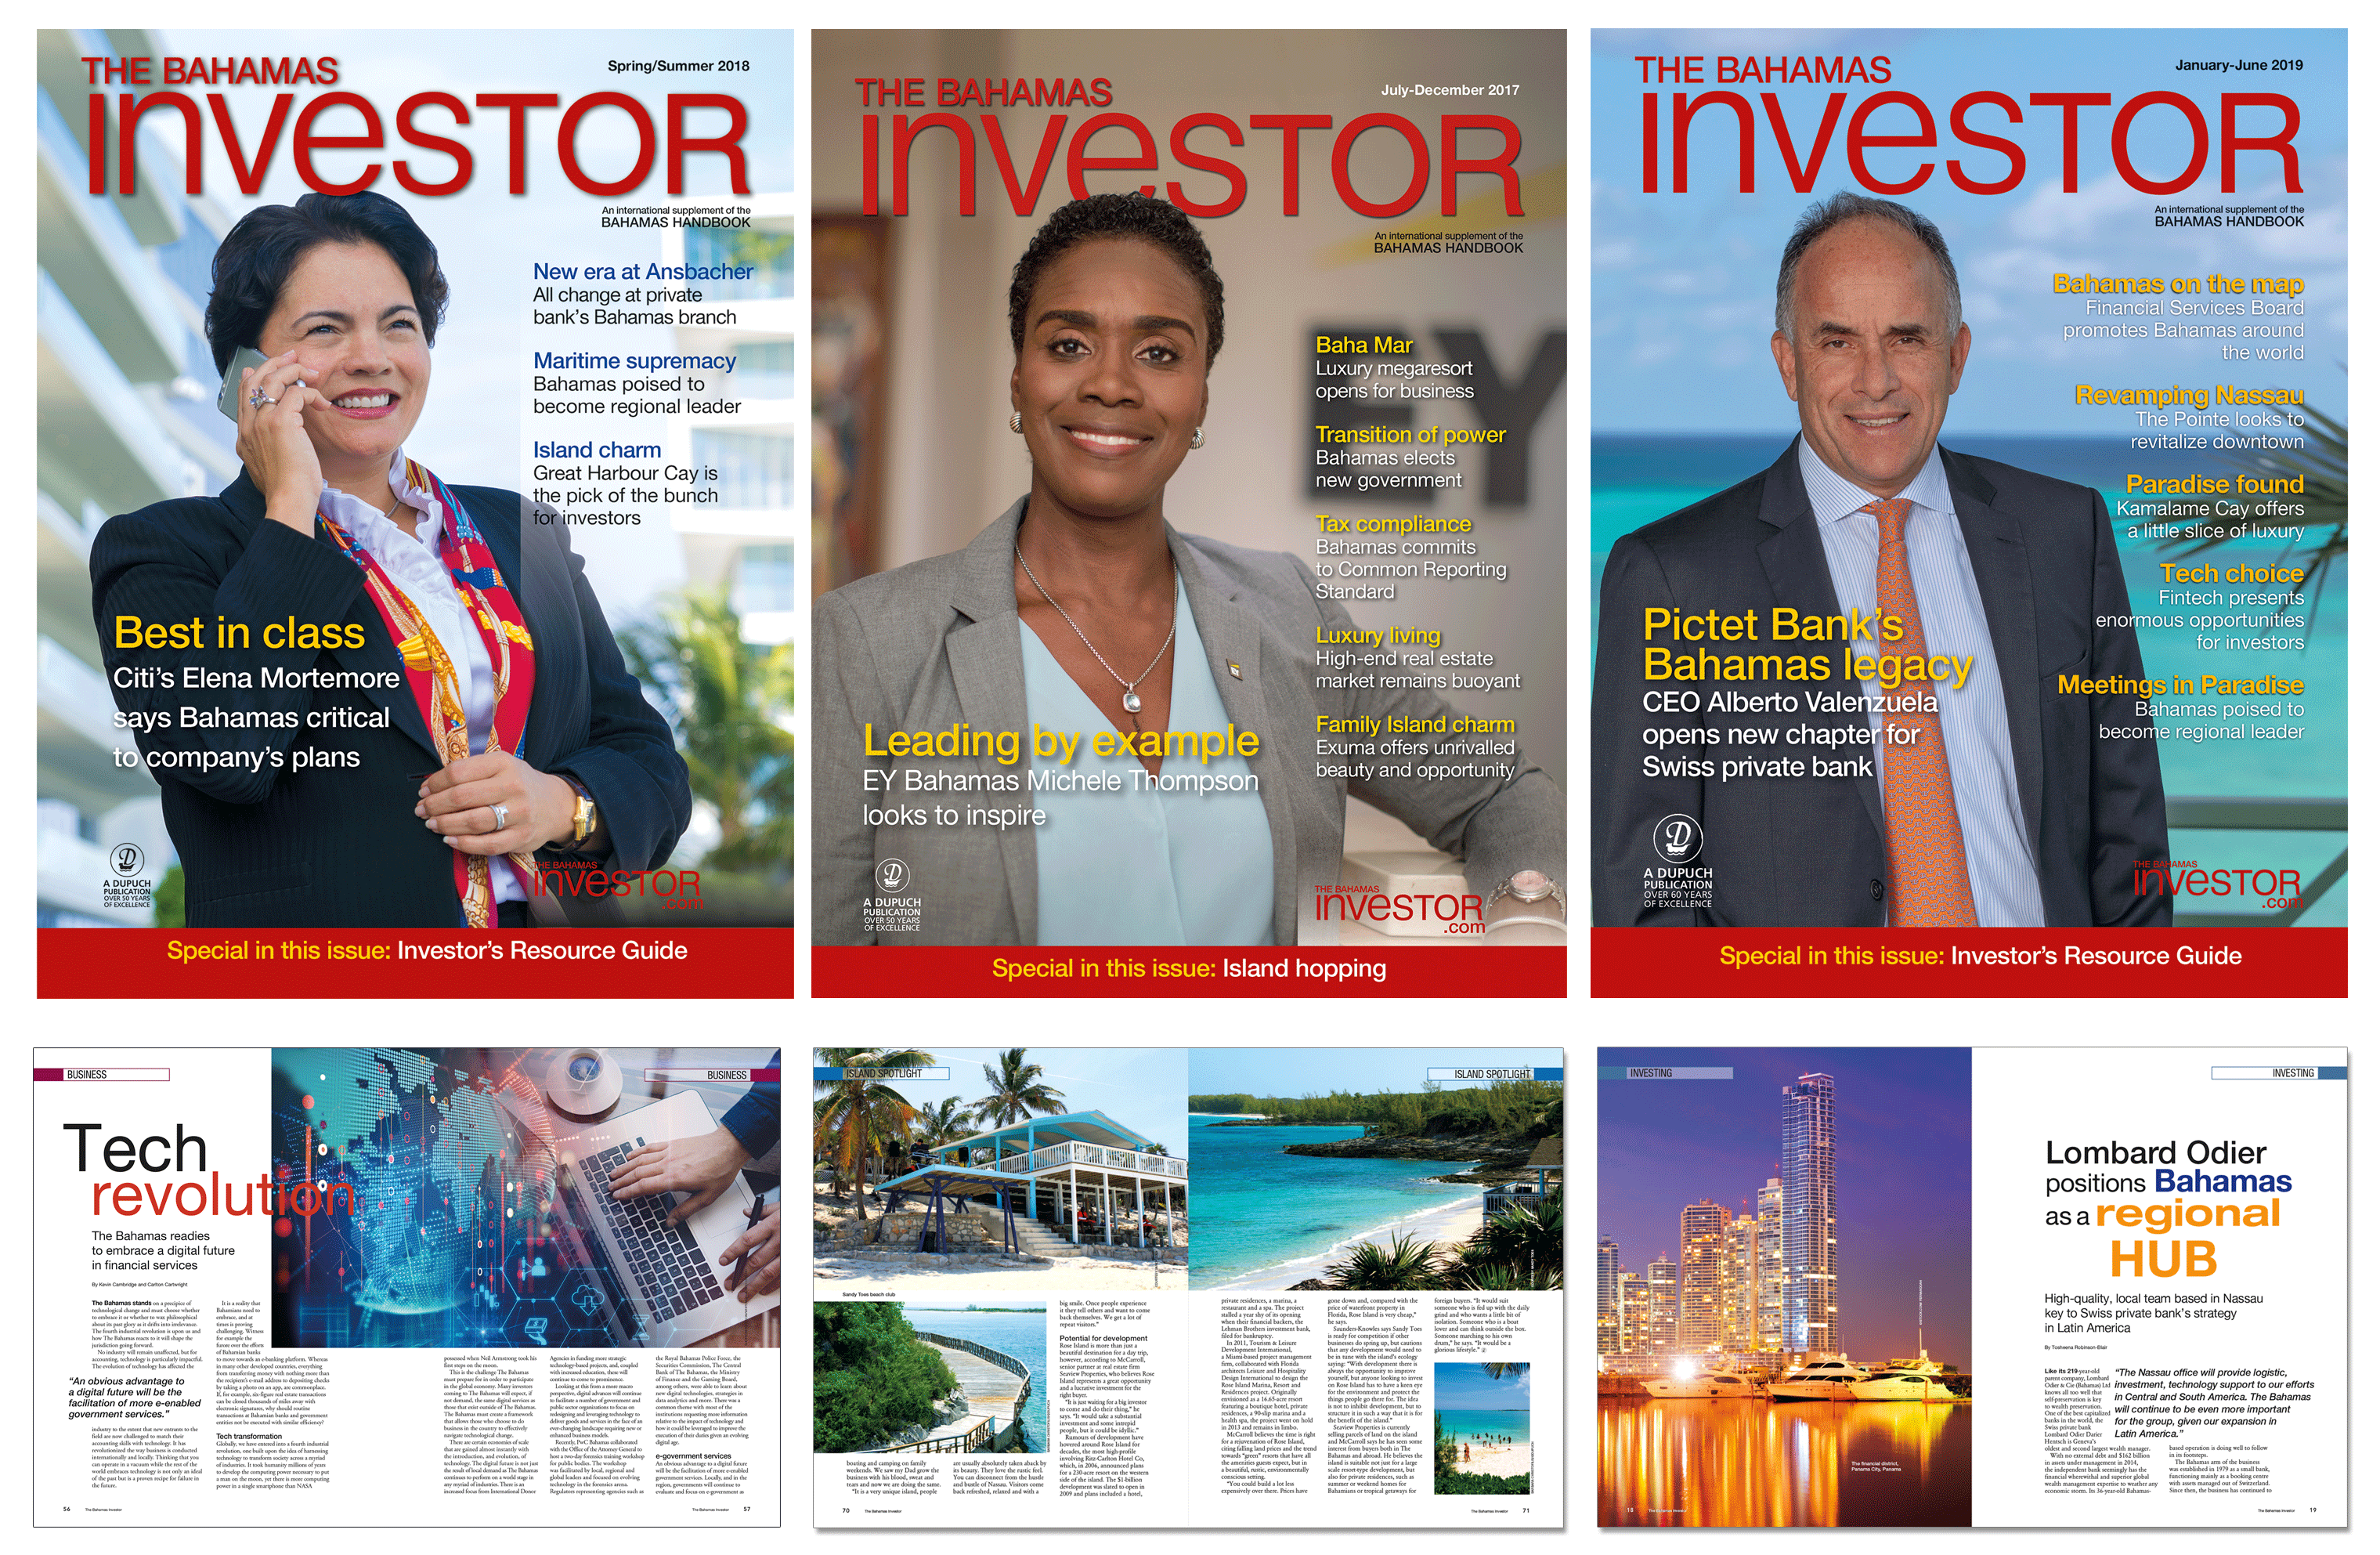 The Bahamas Investor